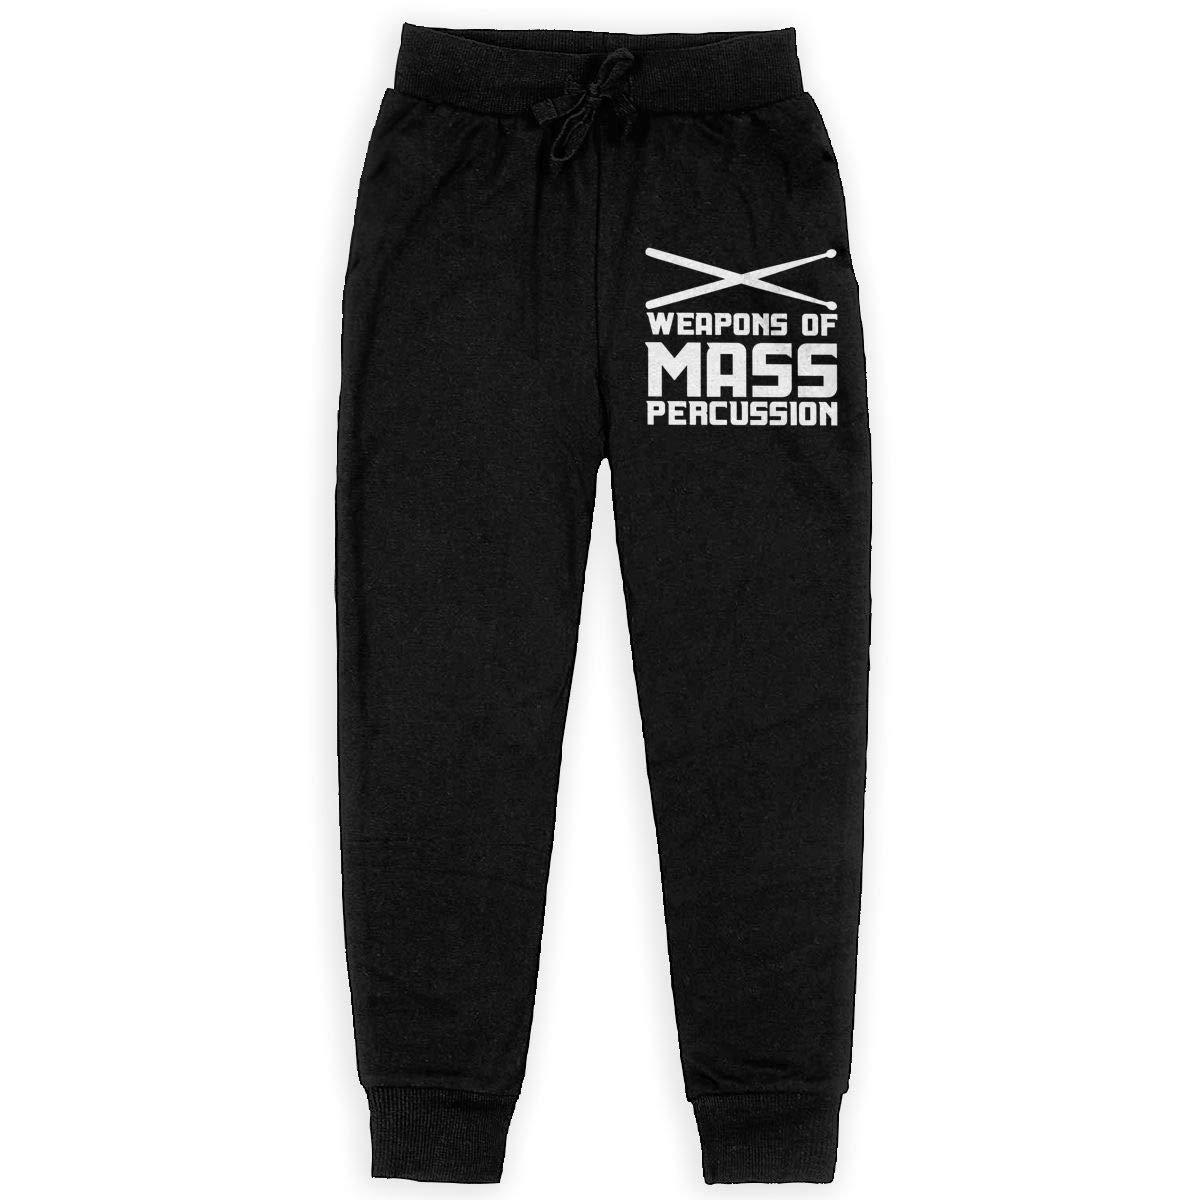 Weapon of Mass Percussion Boys Sweatpants Boys Jogger Pants Boys Fleece Pants Black